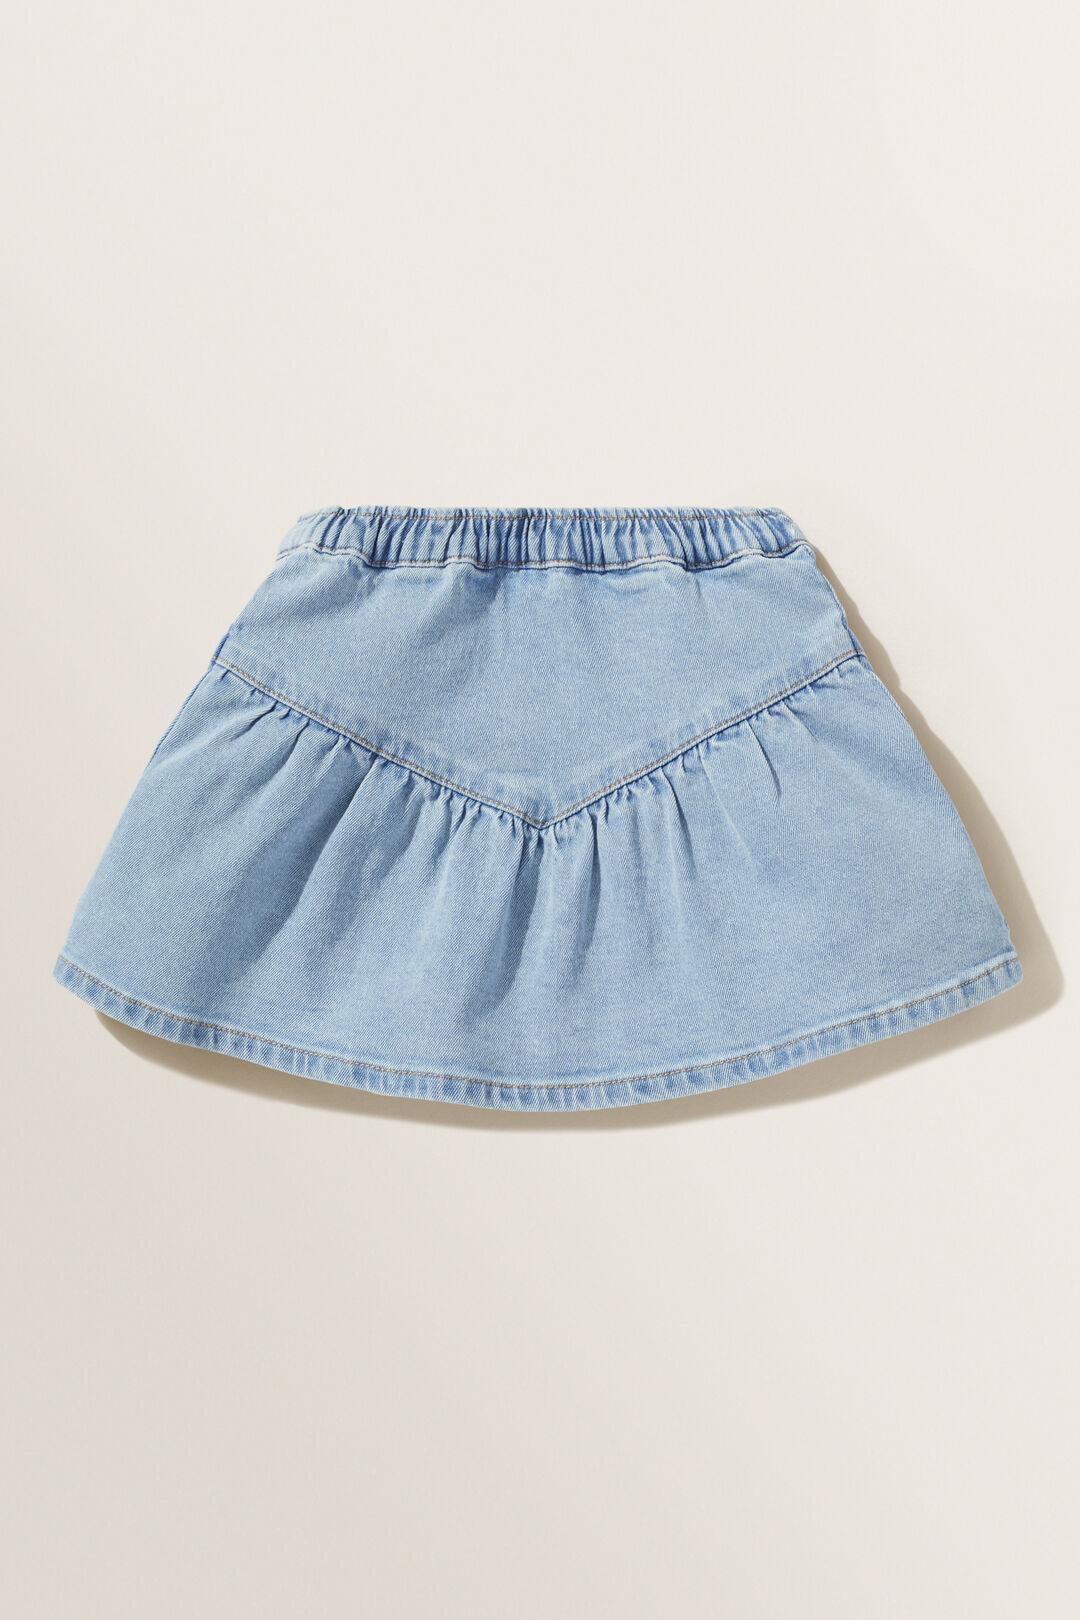 Frill Denim Skirt  CLASSIC WASH  hi-res